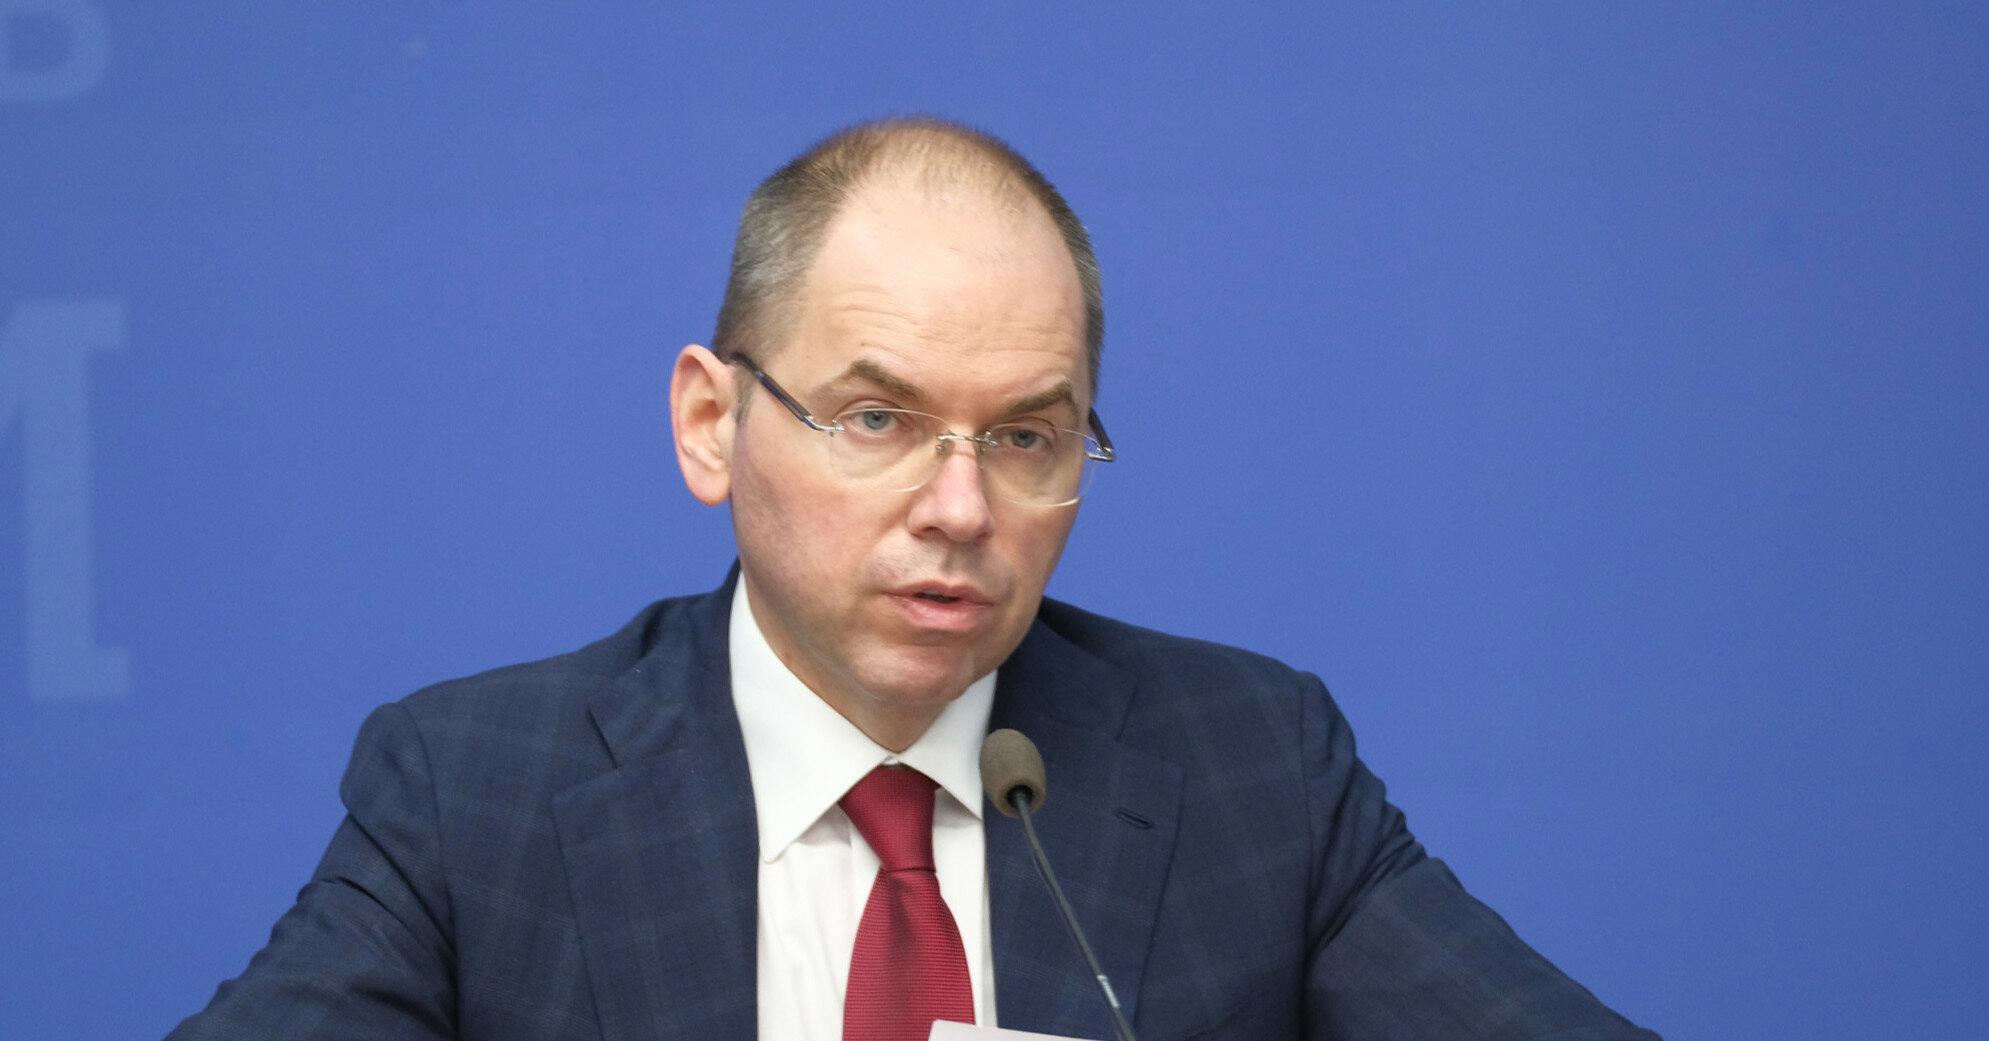 Степанов предложил платить по 500 гривен за вакцинацию